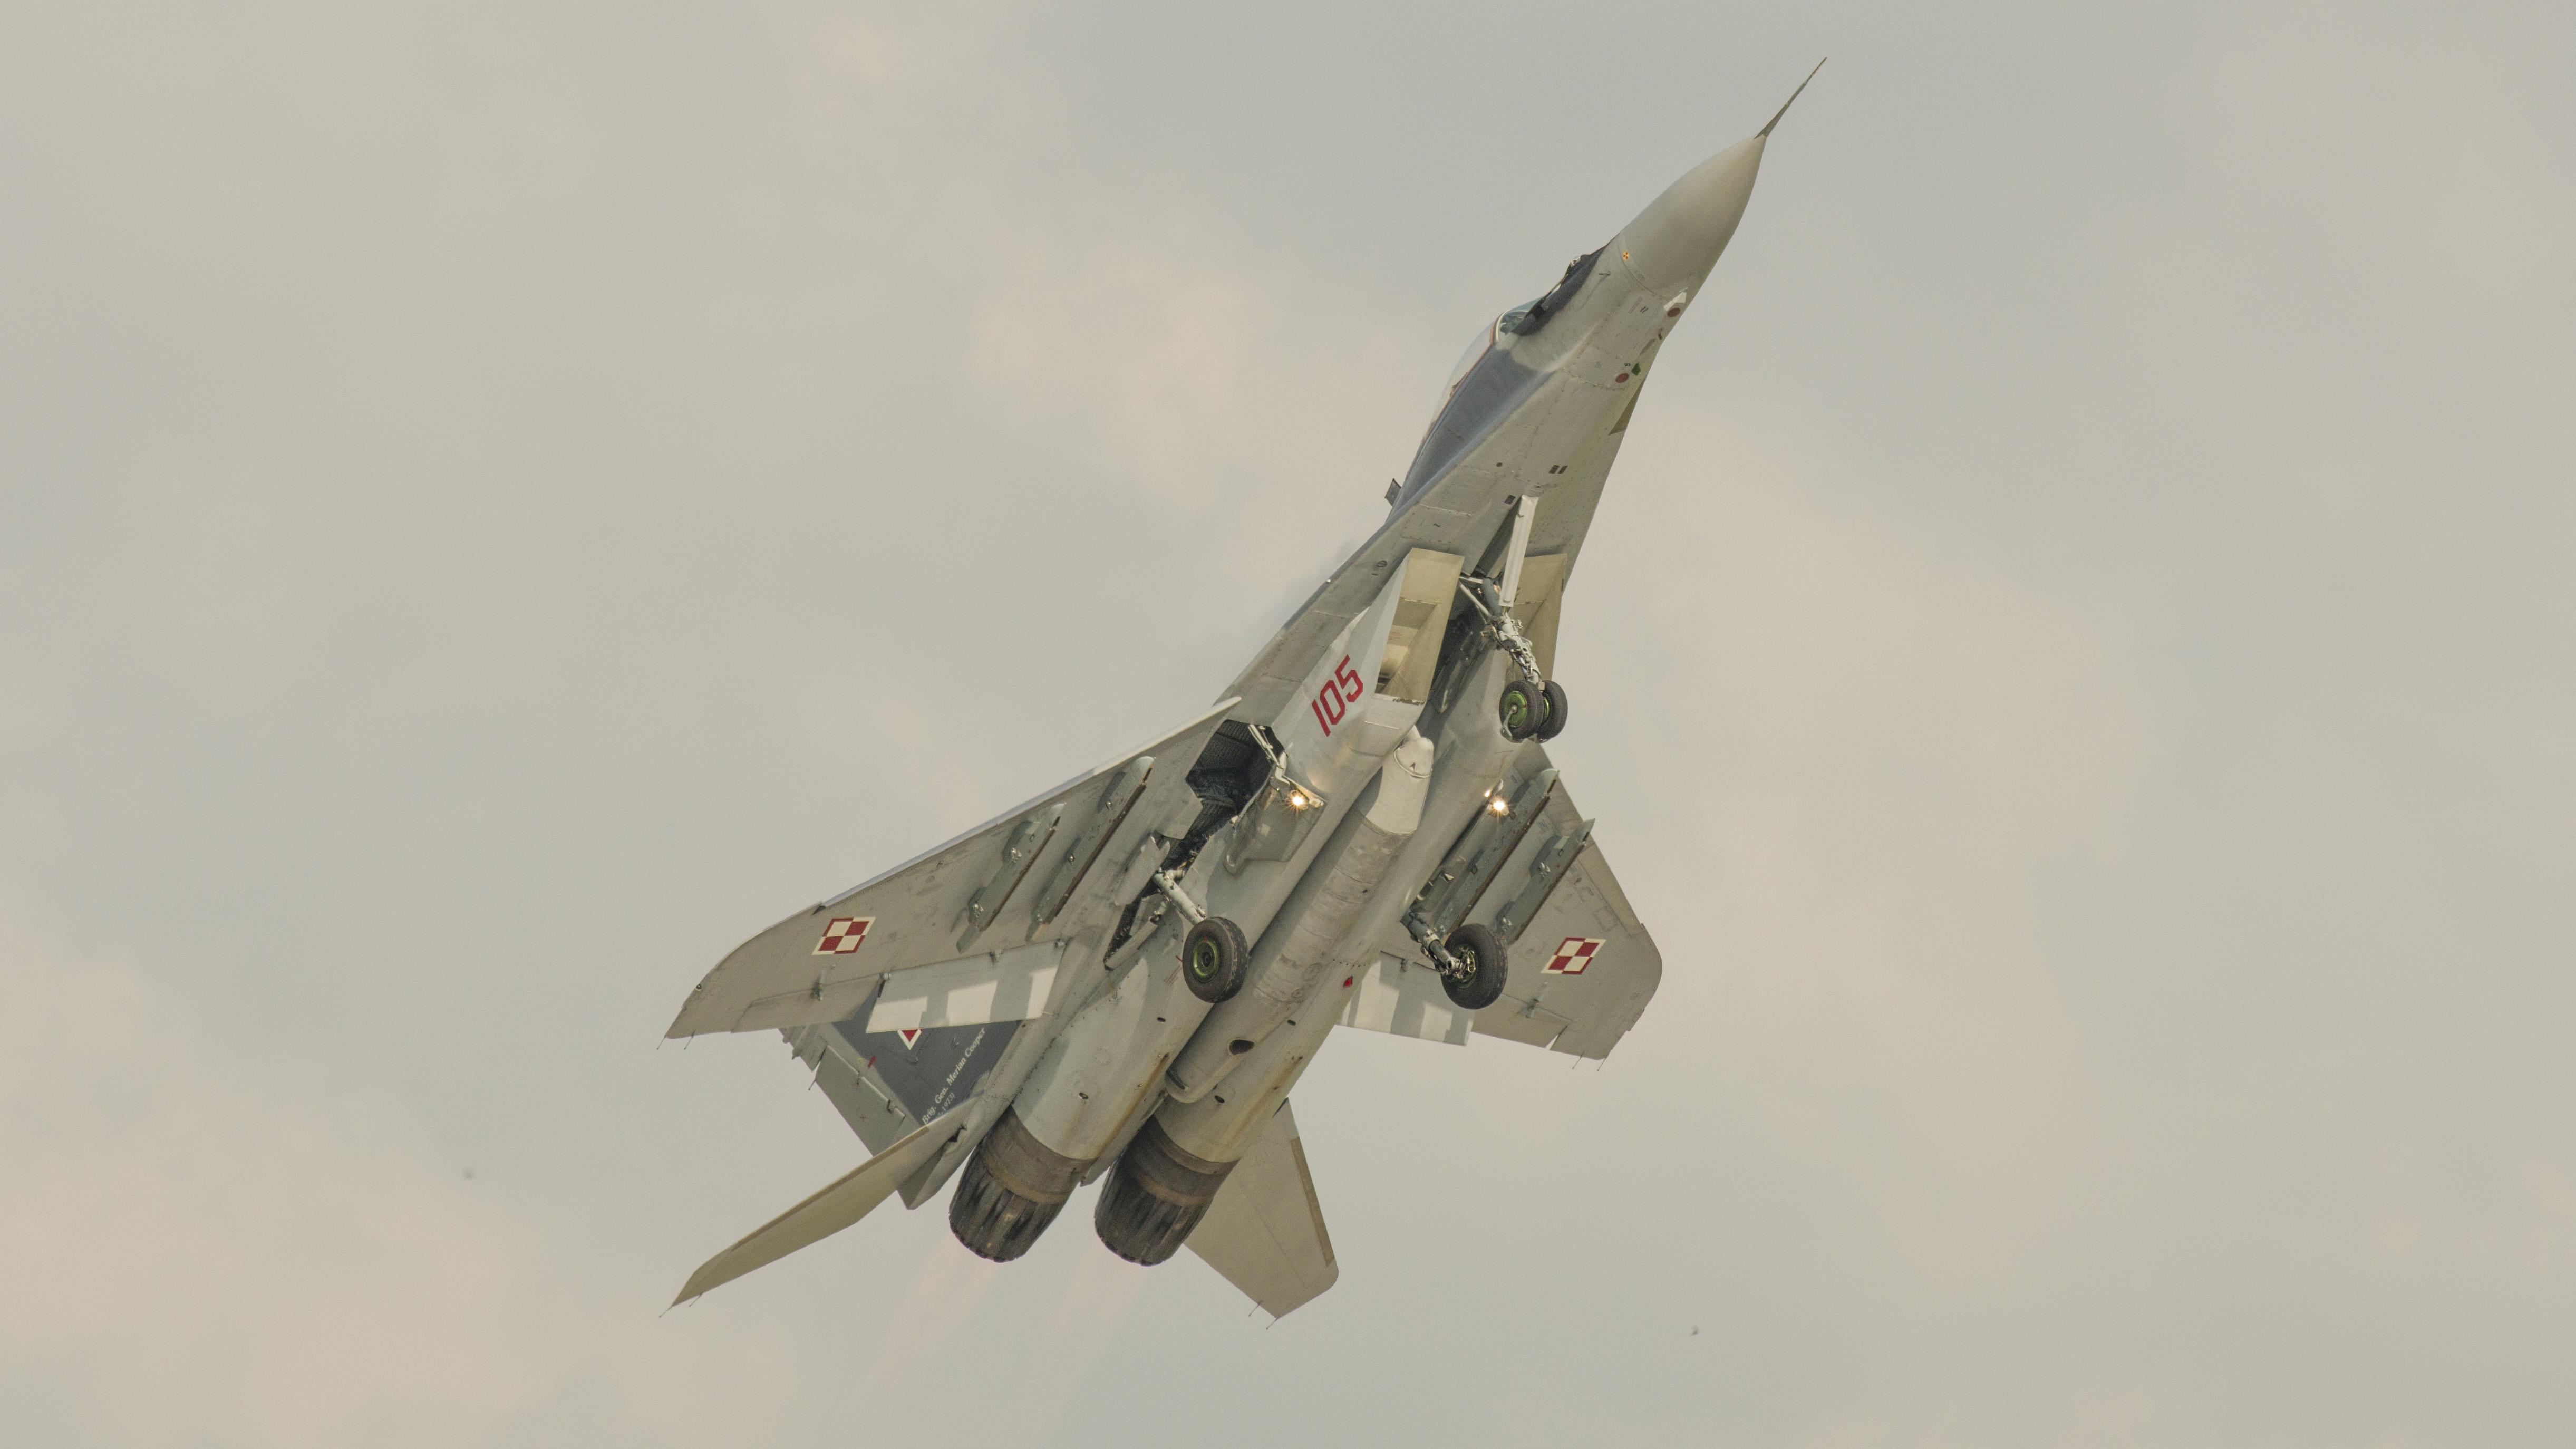 _IMG2096 Mikoyan-Gurevich MiG-29A 9-12A 105 Polish Air Force